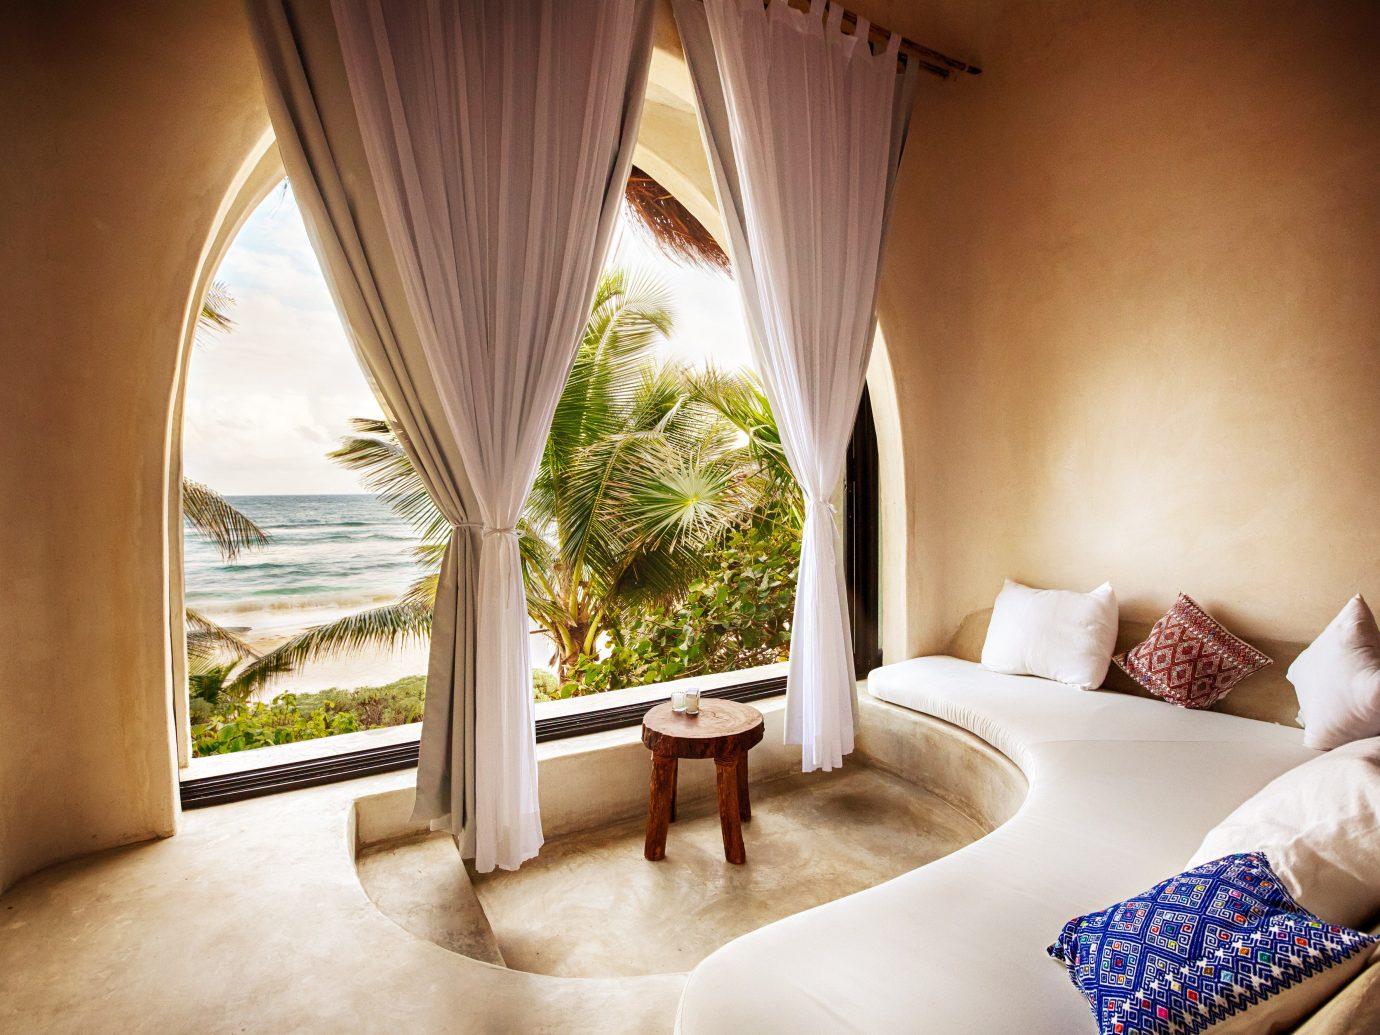 Eco Hotels Island Living Villa indoor wall room property bed hotel estate Resort Suite interior design Bedroom furniture decorated